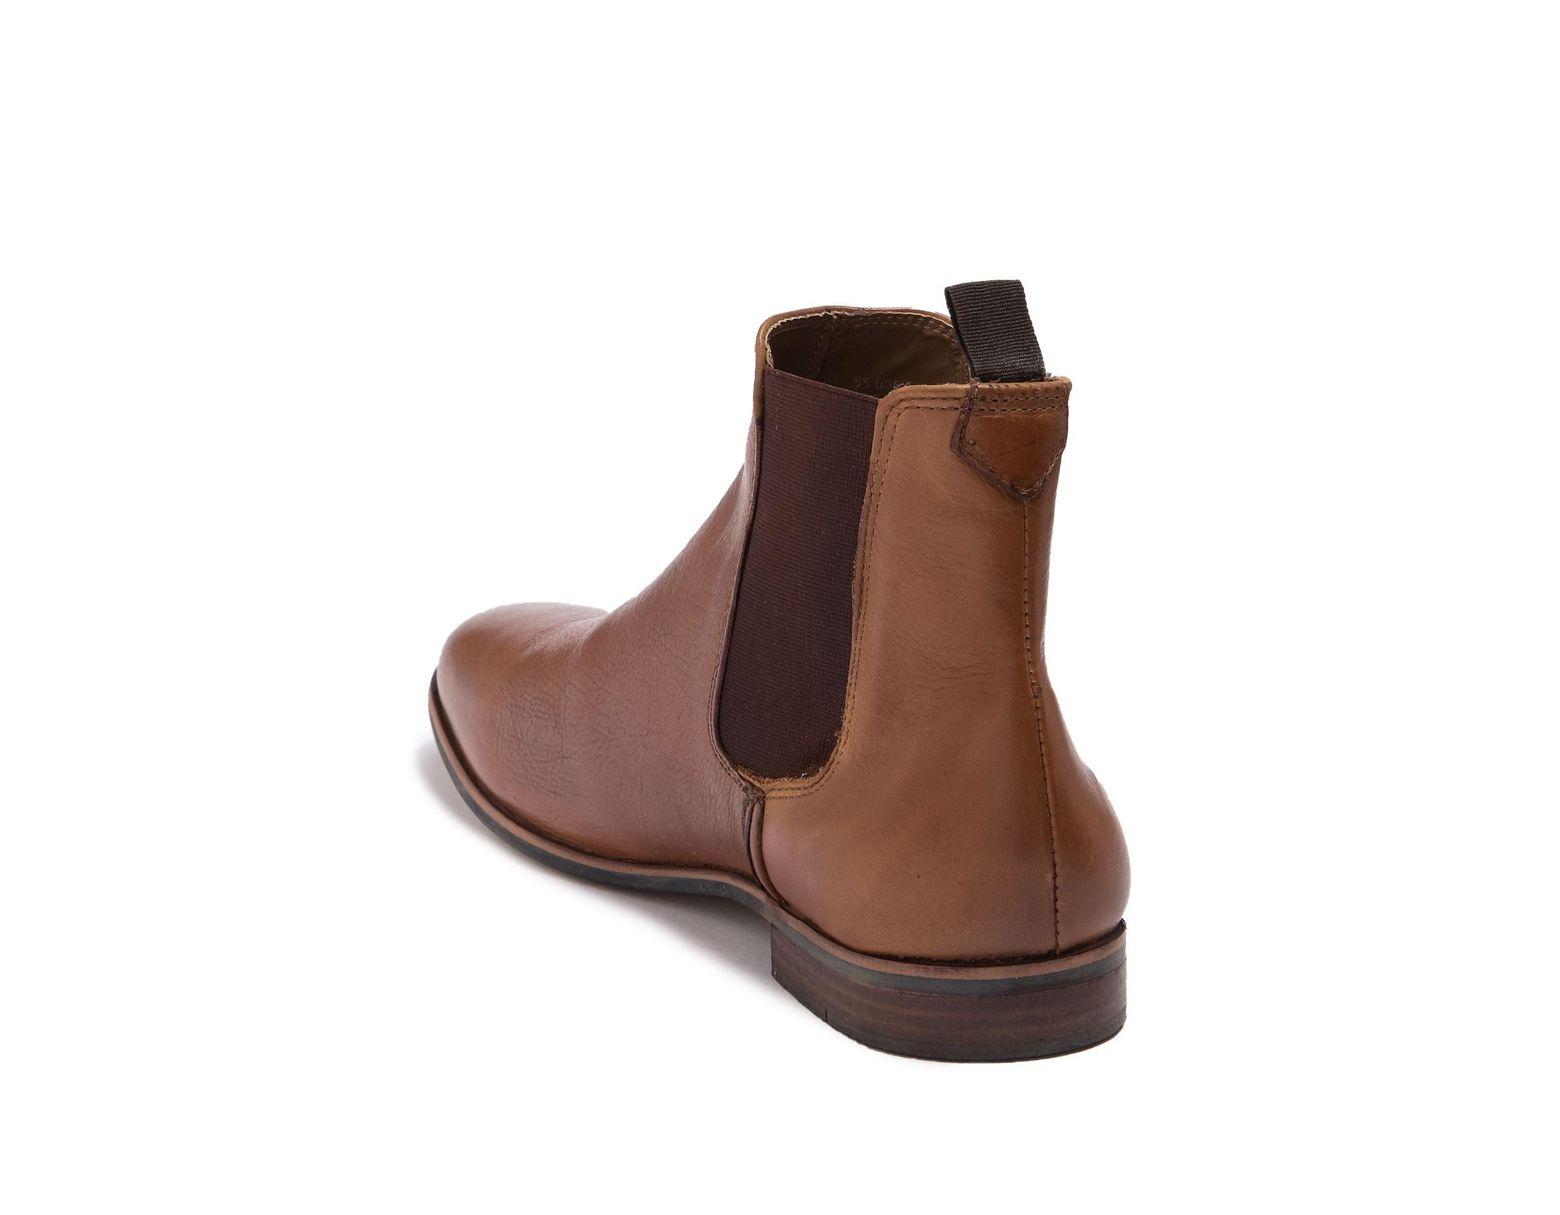 60b7ff04050 Men's Brown Track Chelsea Boot